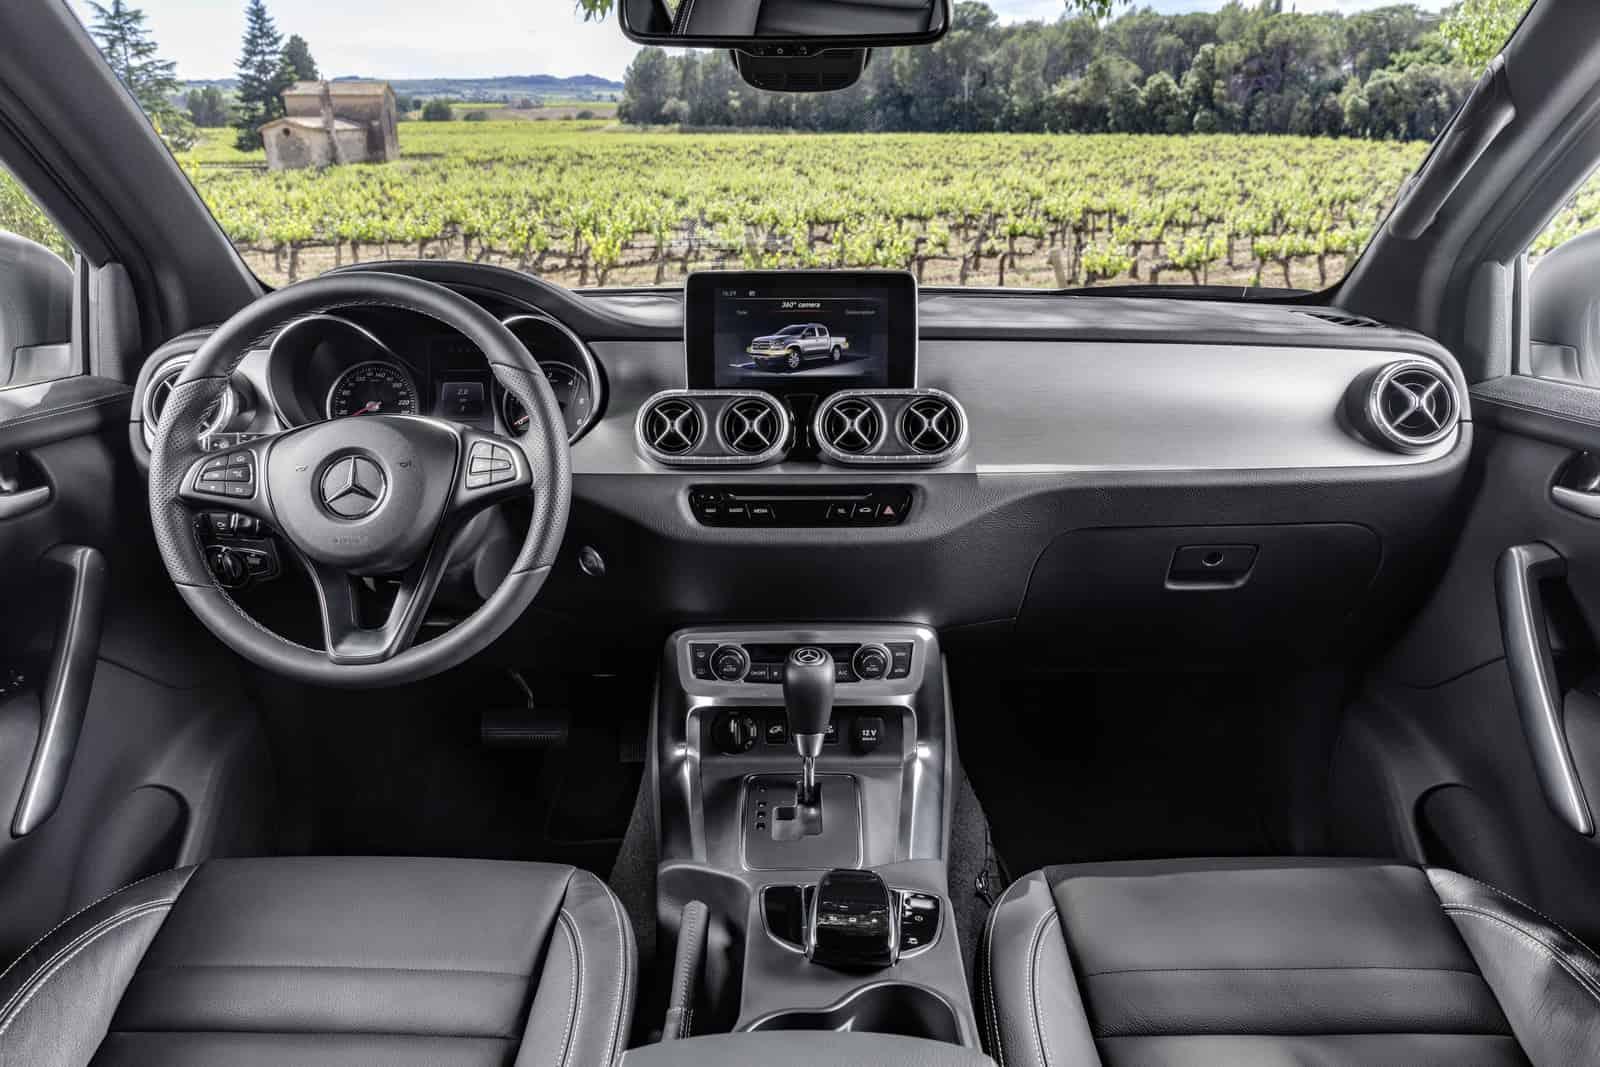 Mercedes-Benz X-Klasse – Interieur, Ausstattungslinie POWER  Mercedes-Benz X-Class – Interior, design and equipment line POWER